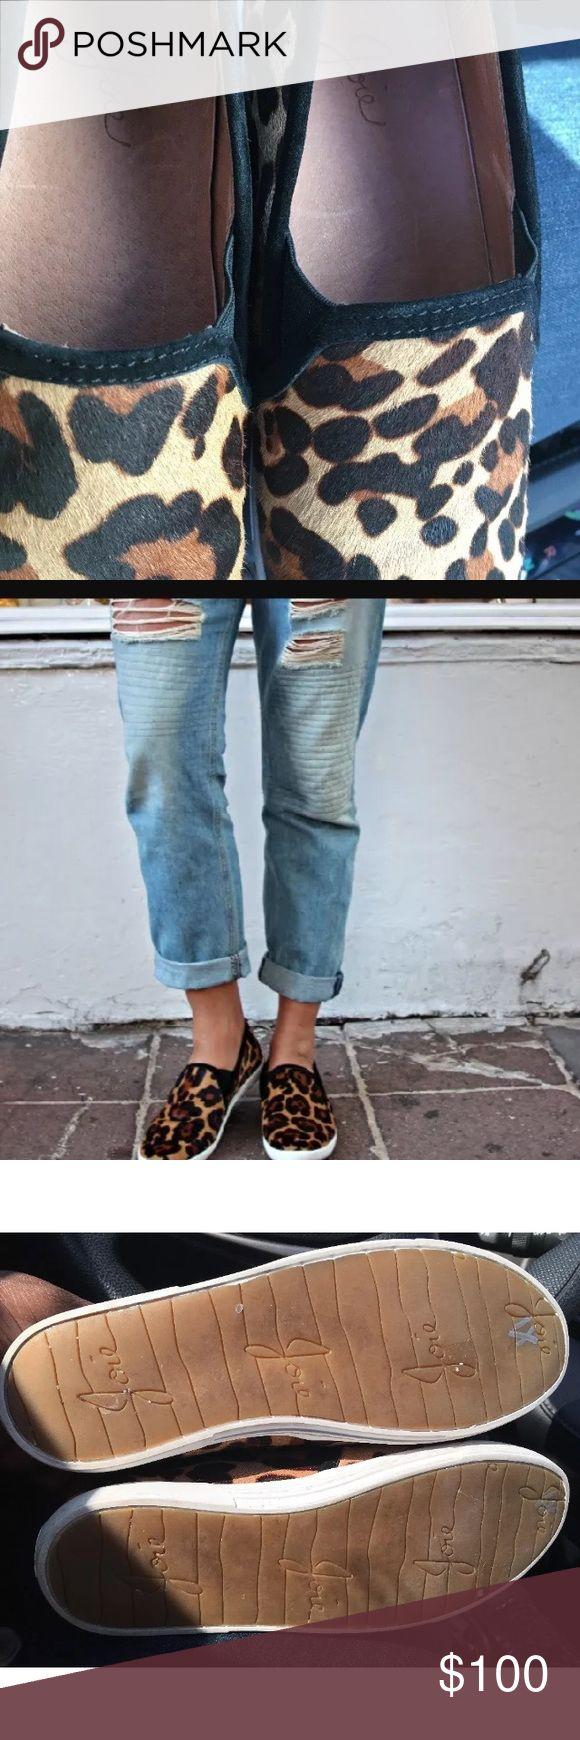 Joie Sneakers size 6medium (36.5 Europe ) Calf hair upper leopard print gently used Joie Shoes Sneakers